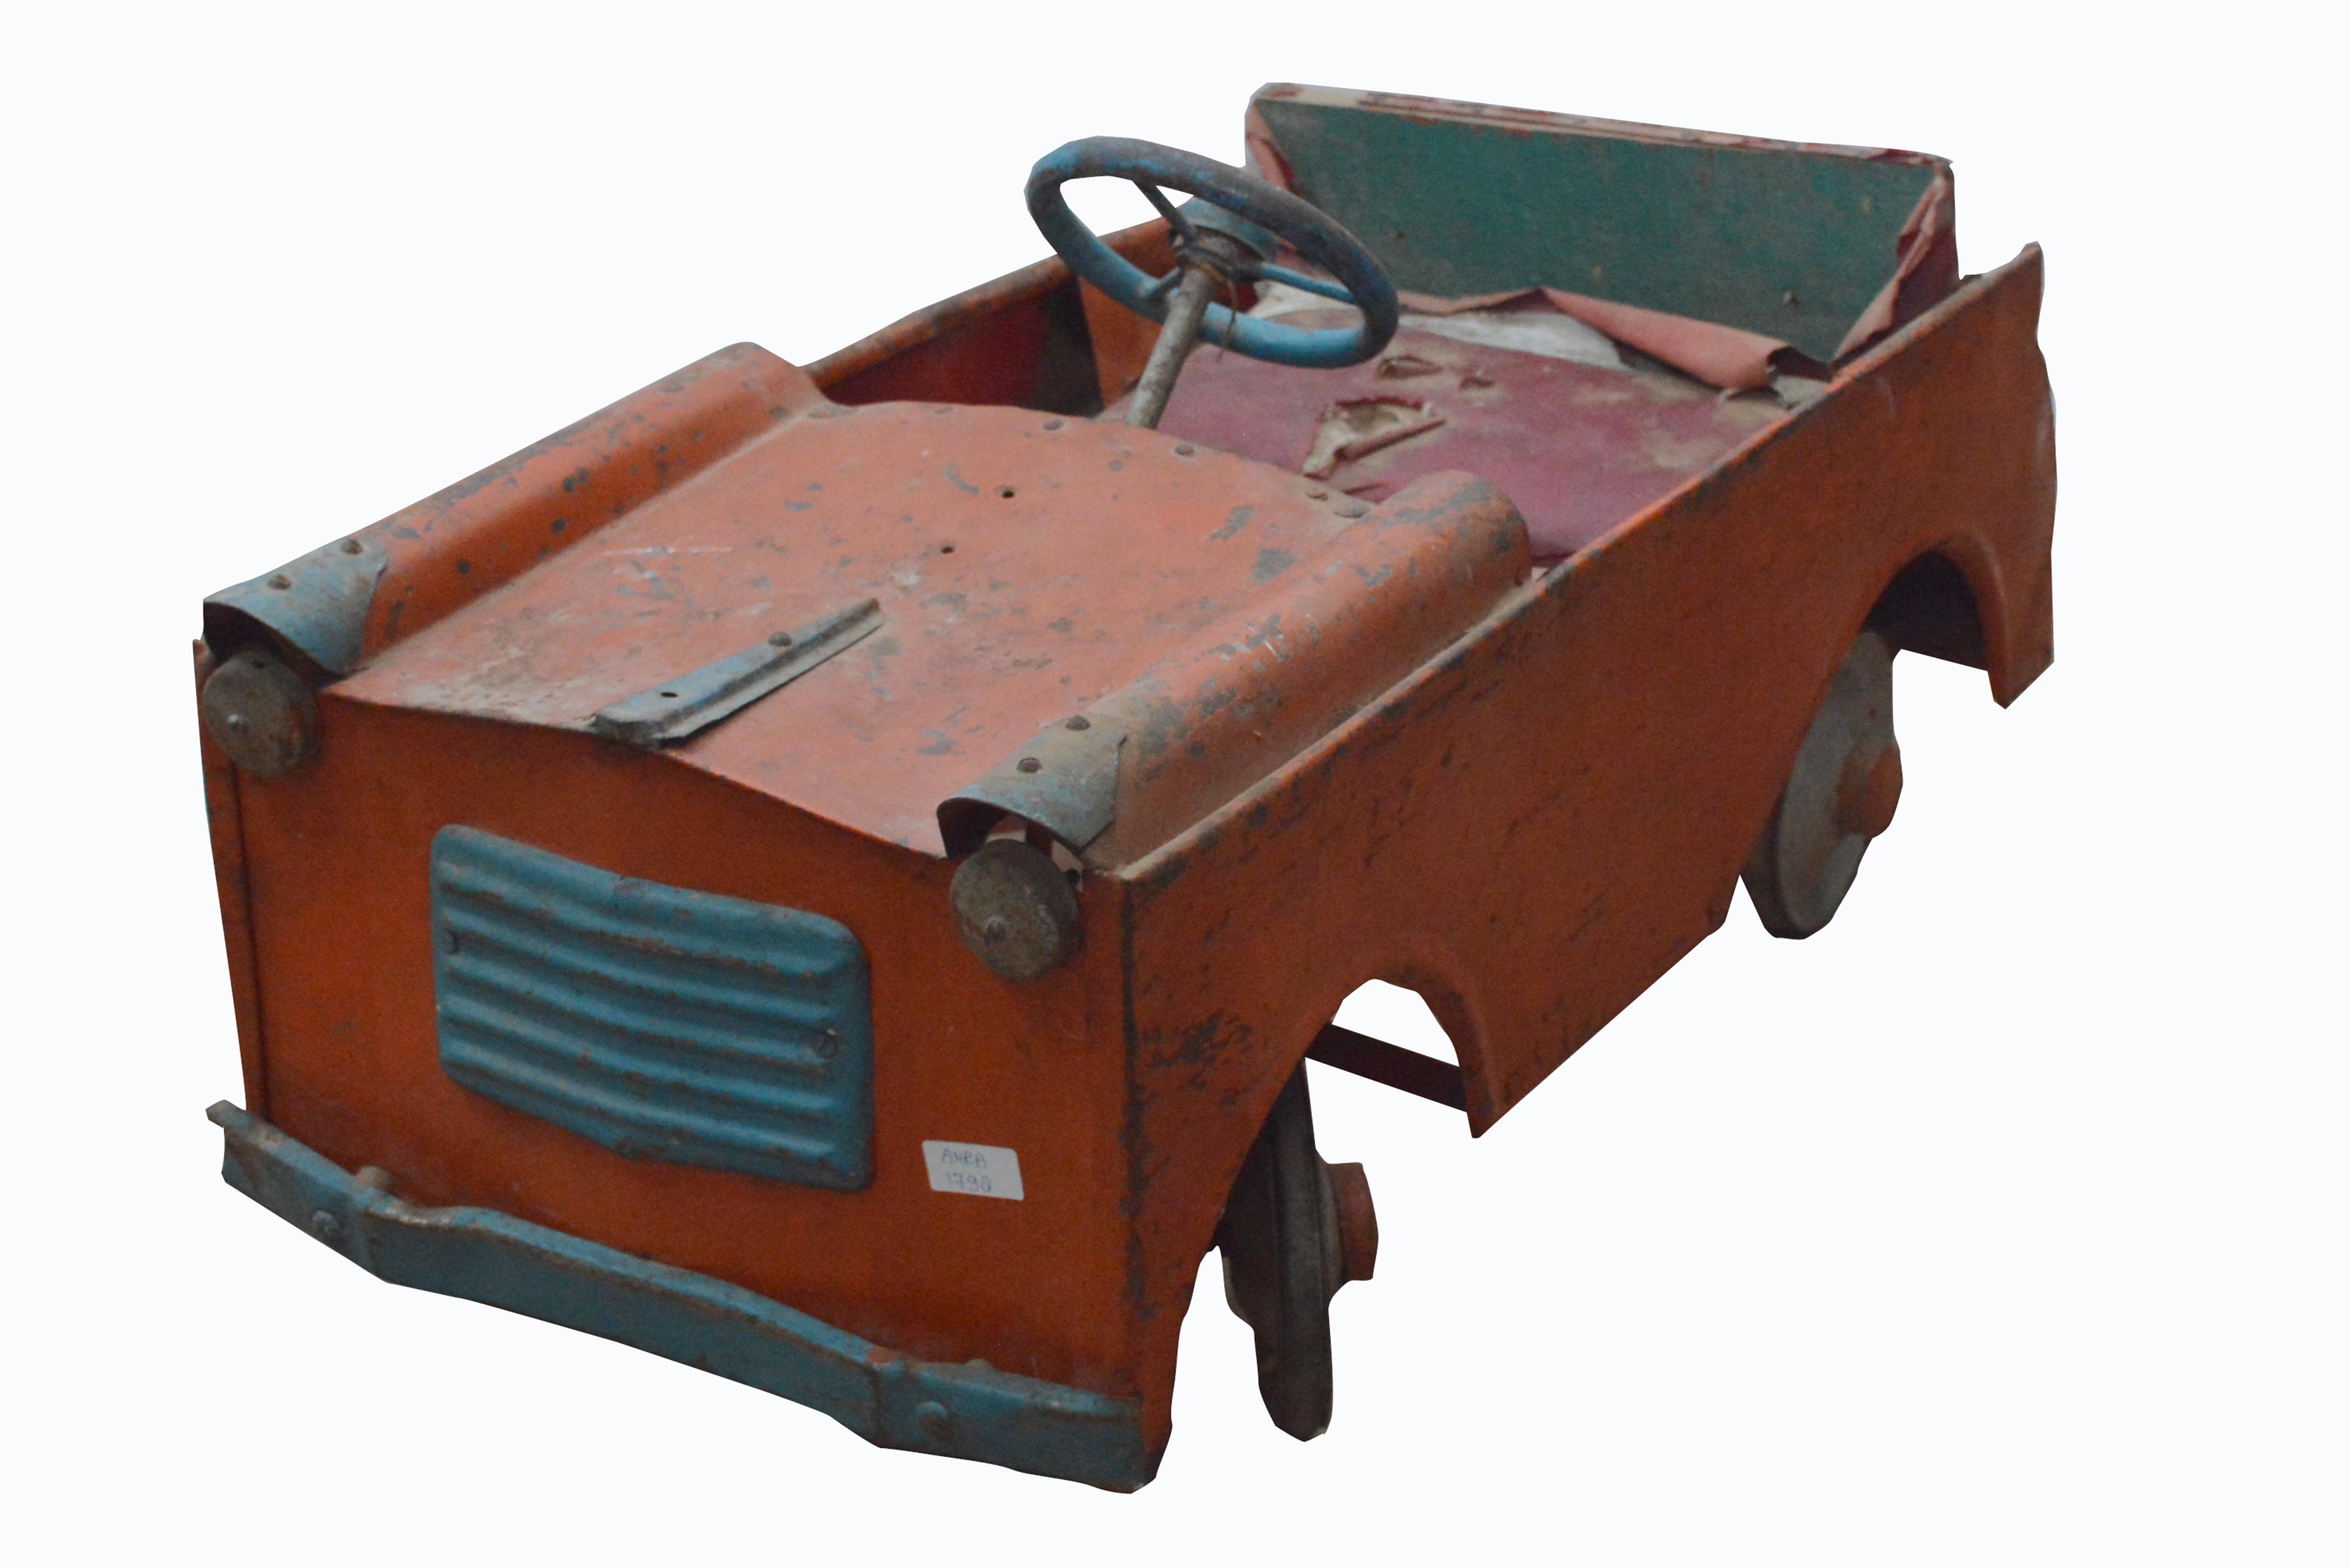 ANRA1798 - 80 x 40 x 40cm